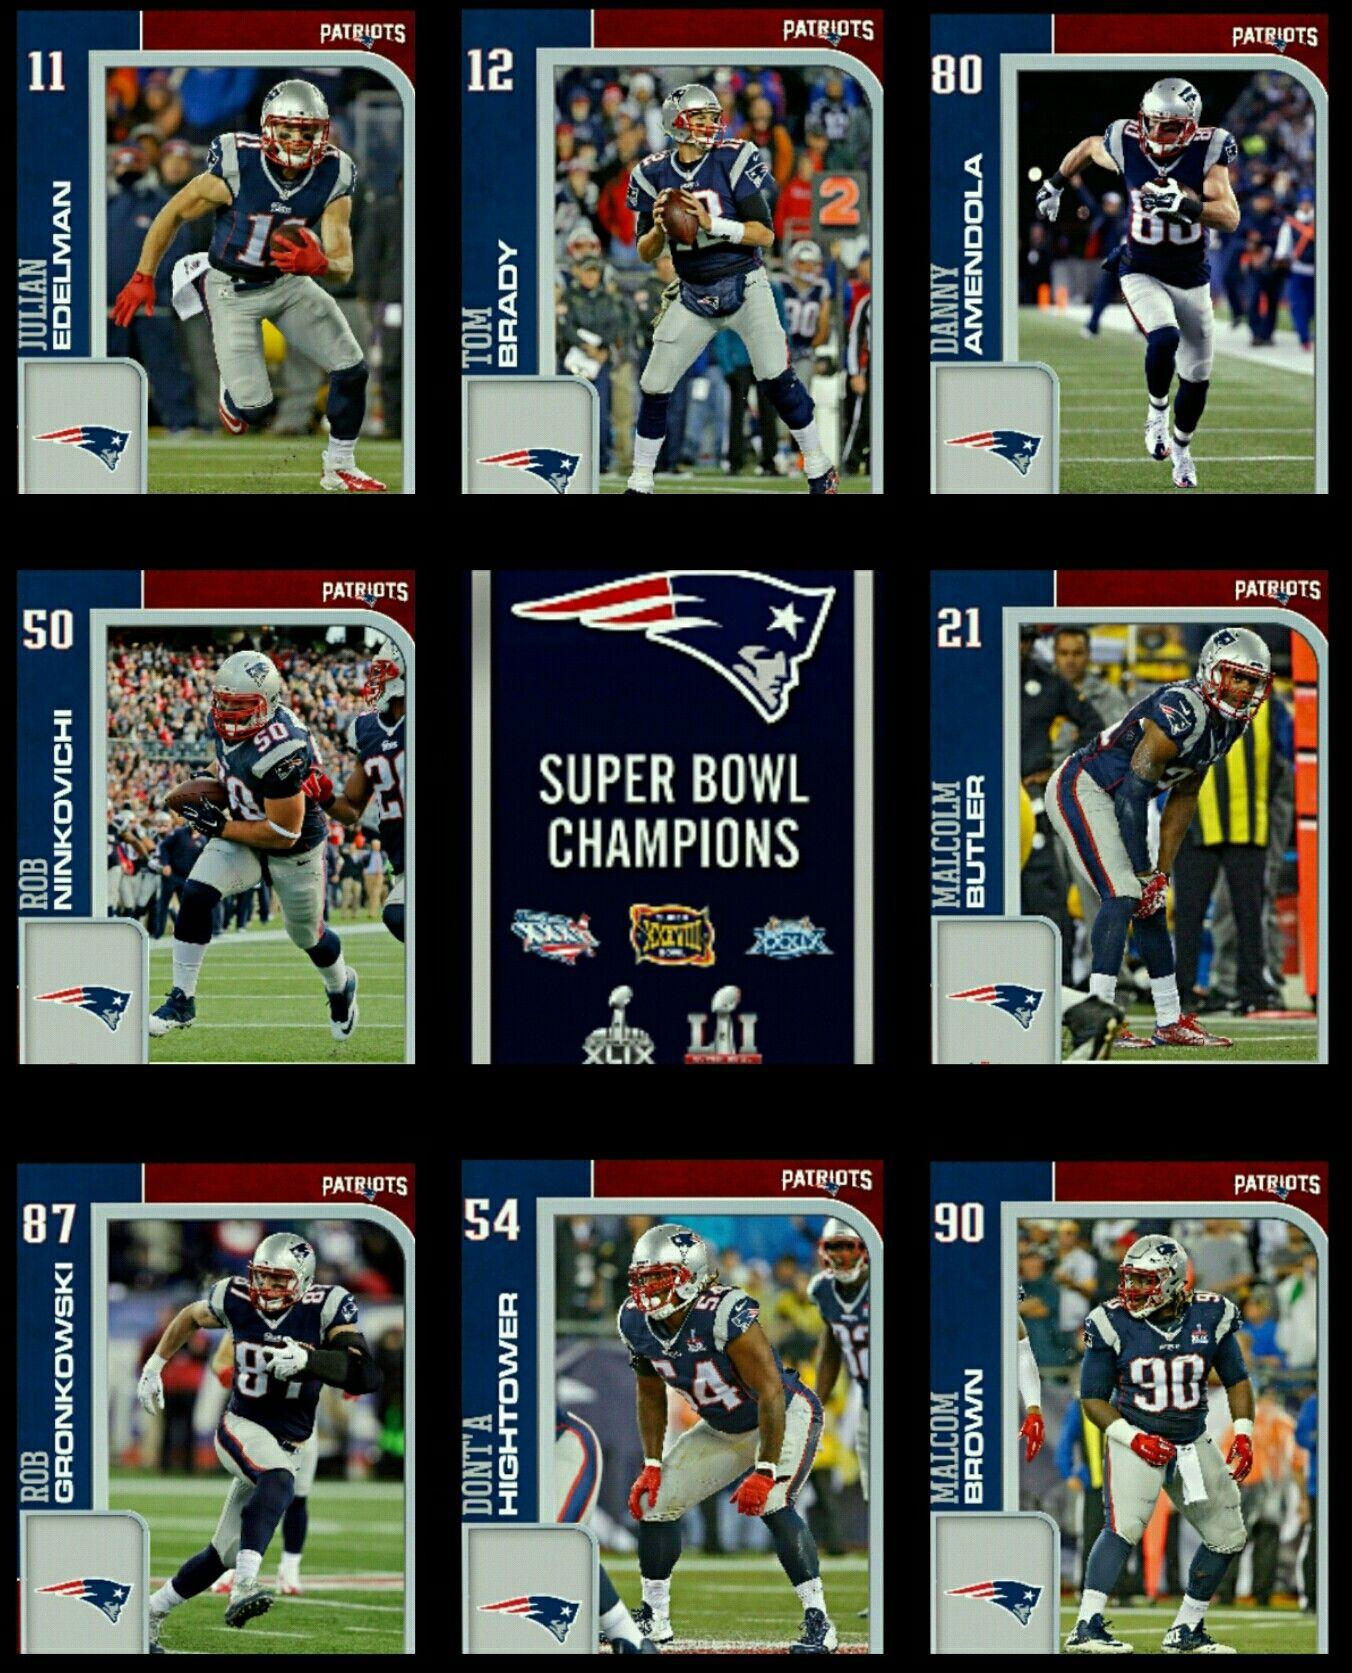 Pin By Christian Jensen On Patriots New England Patriots Football Cards Patriots